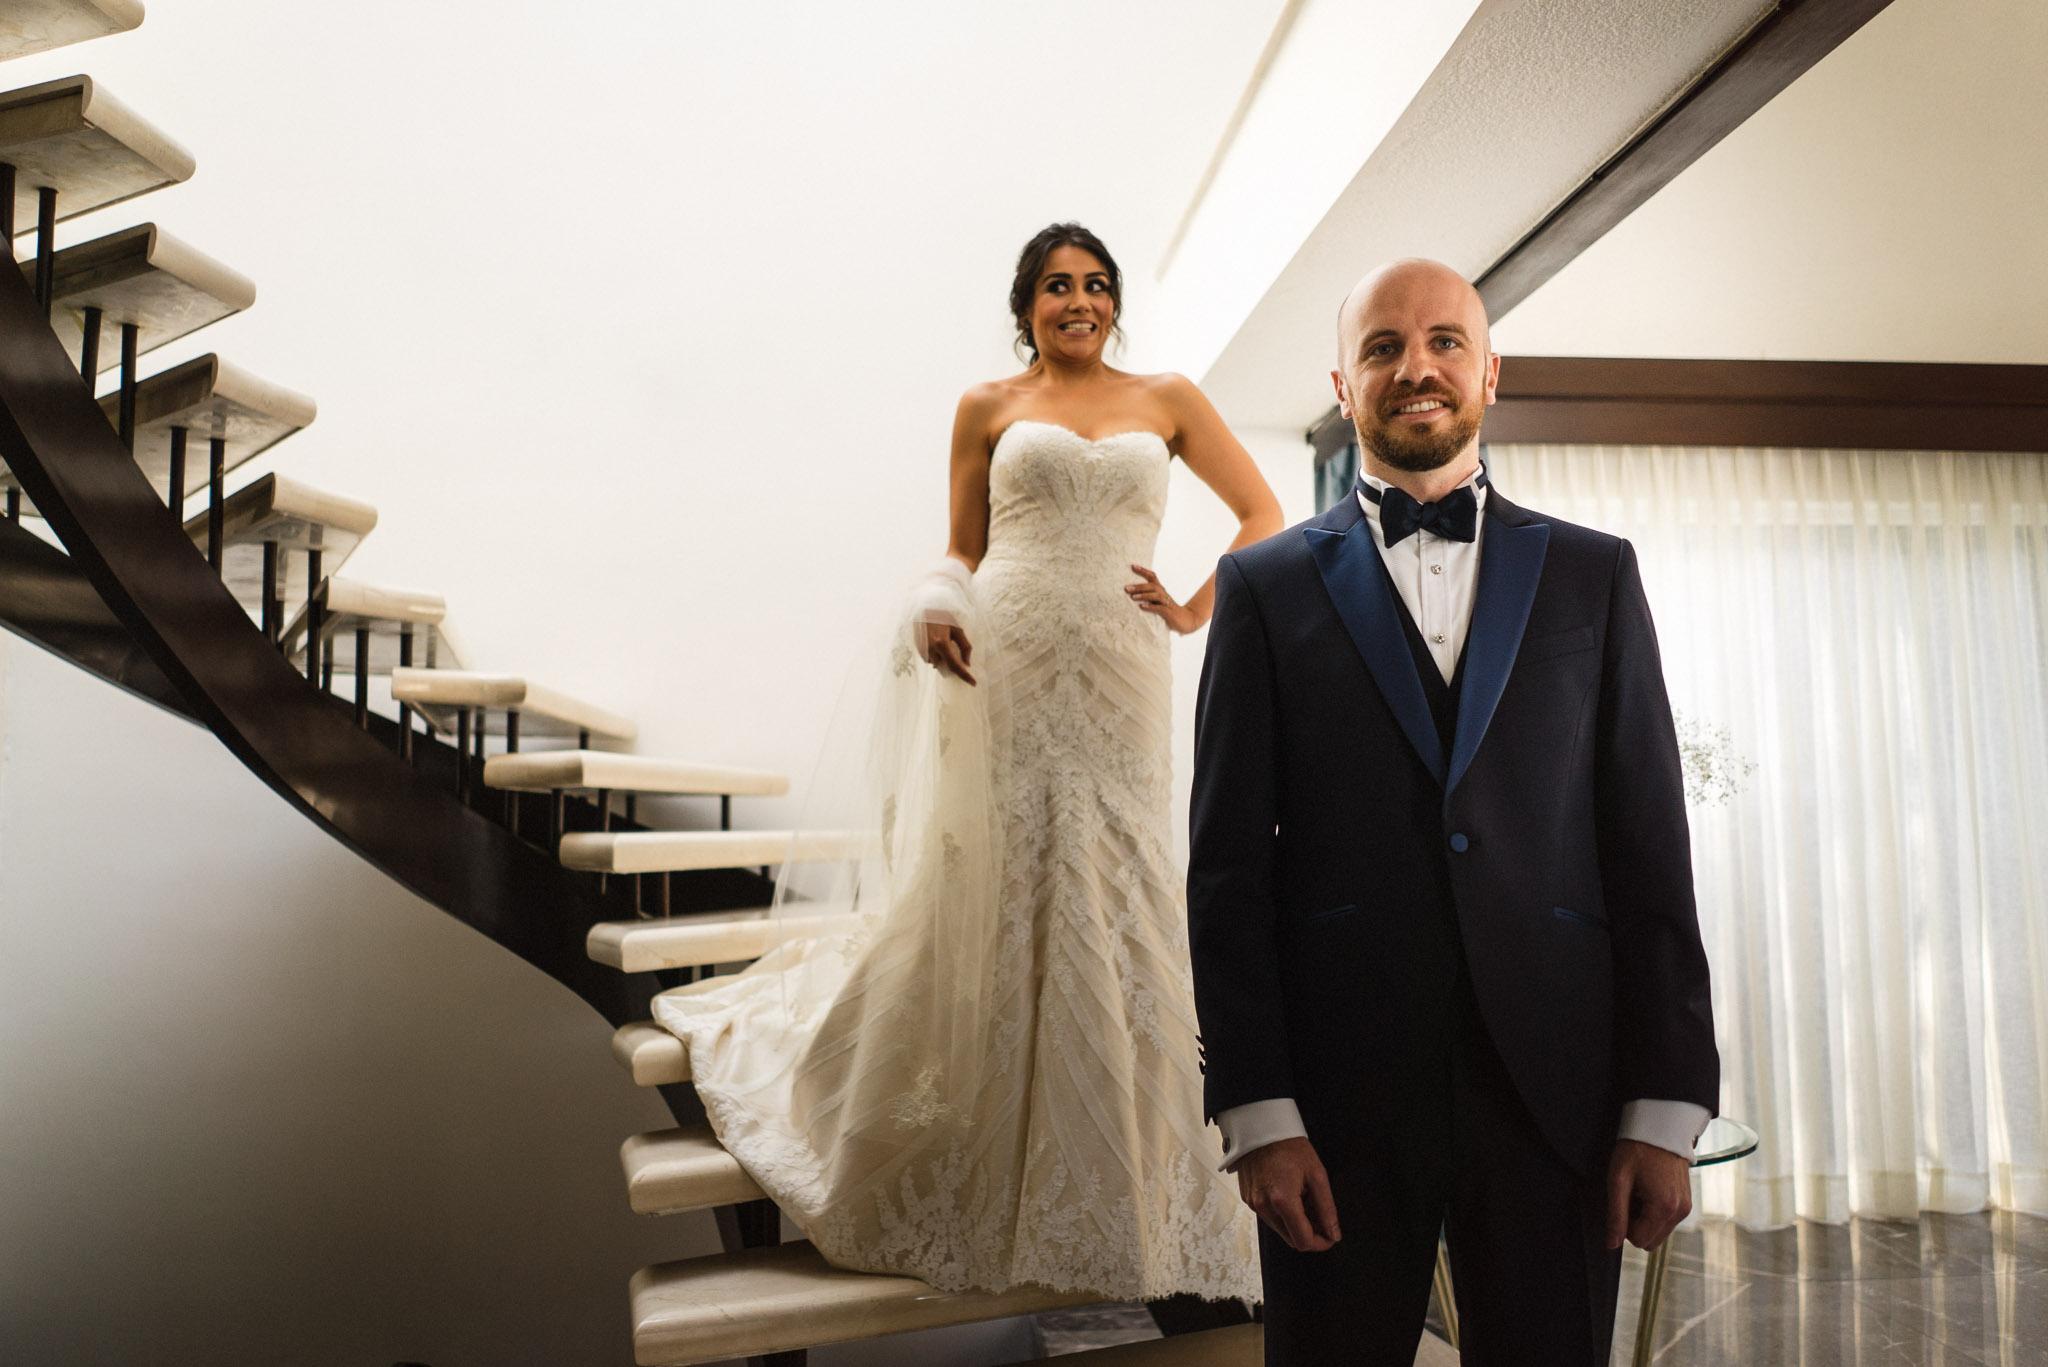 ©www.mauriziosolisbroca.com-20161001maurizio-solis-broca-mexico-canada-wedding-photographer20161001DSC07036-2-Edit.jpg